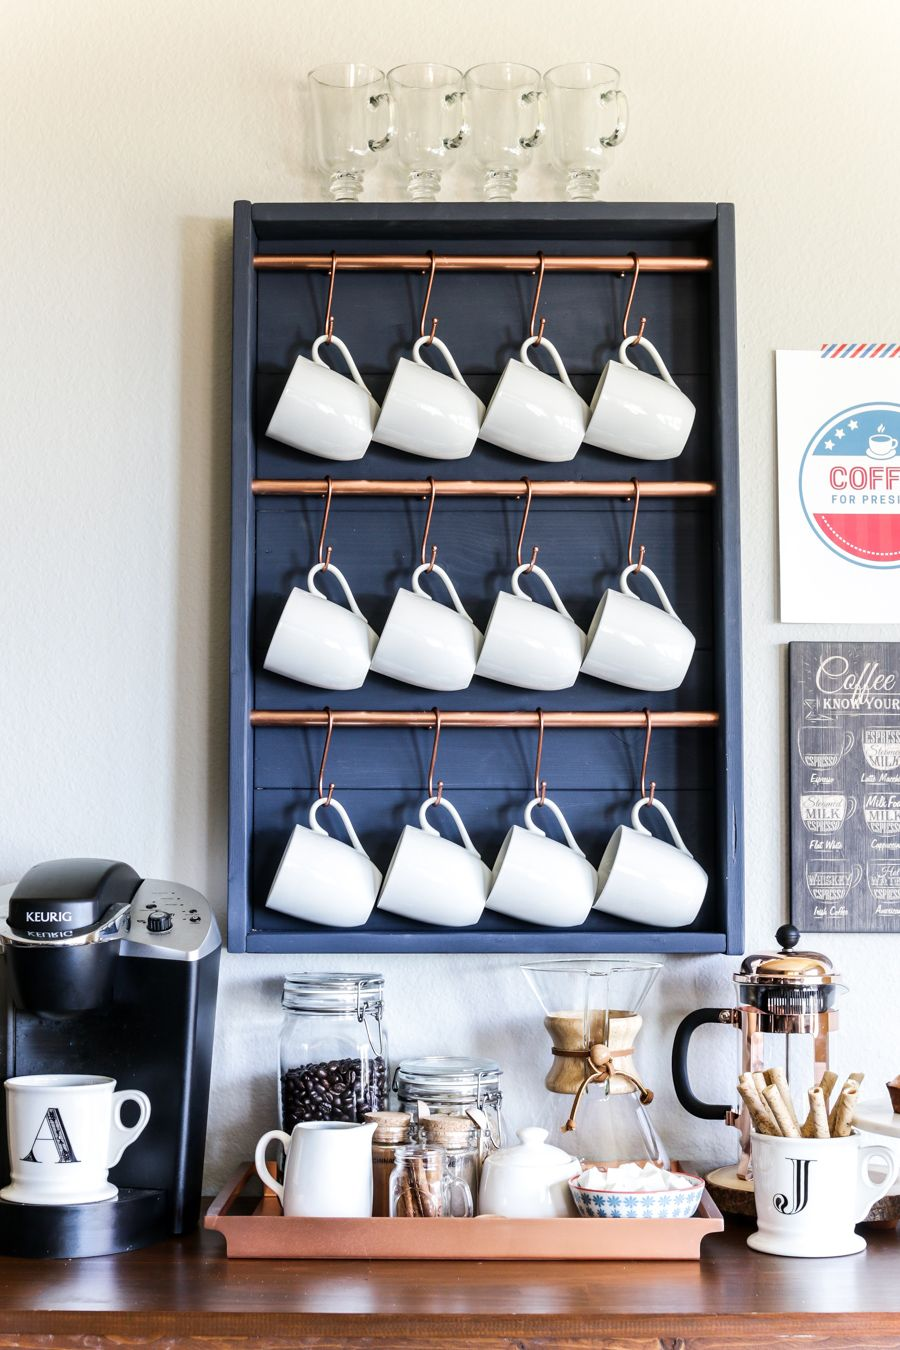 Coffee Bar Ideas - Hanging Mugs